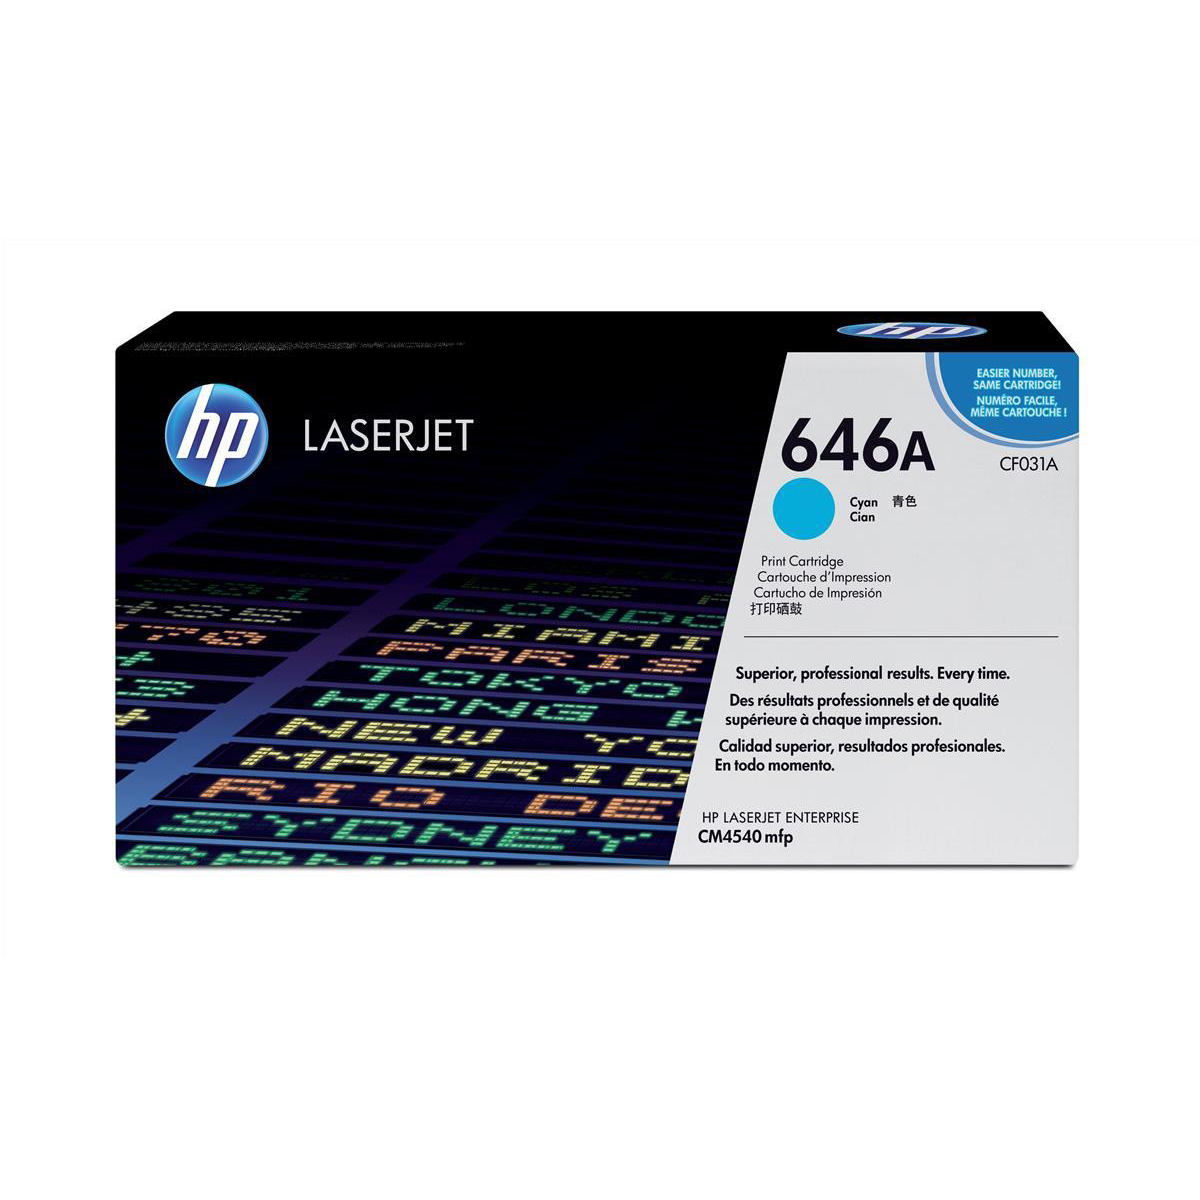 Image for HP 646A Cyan LaserJet Toner CF031A